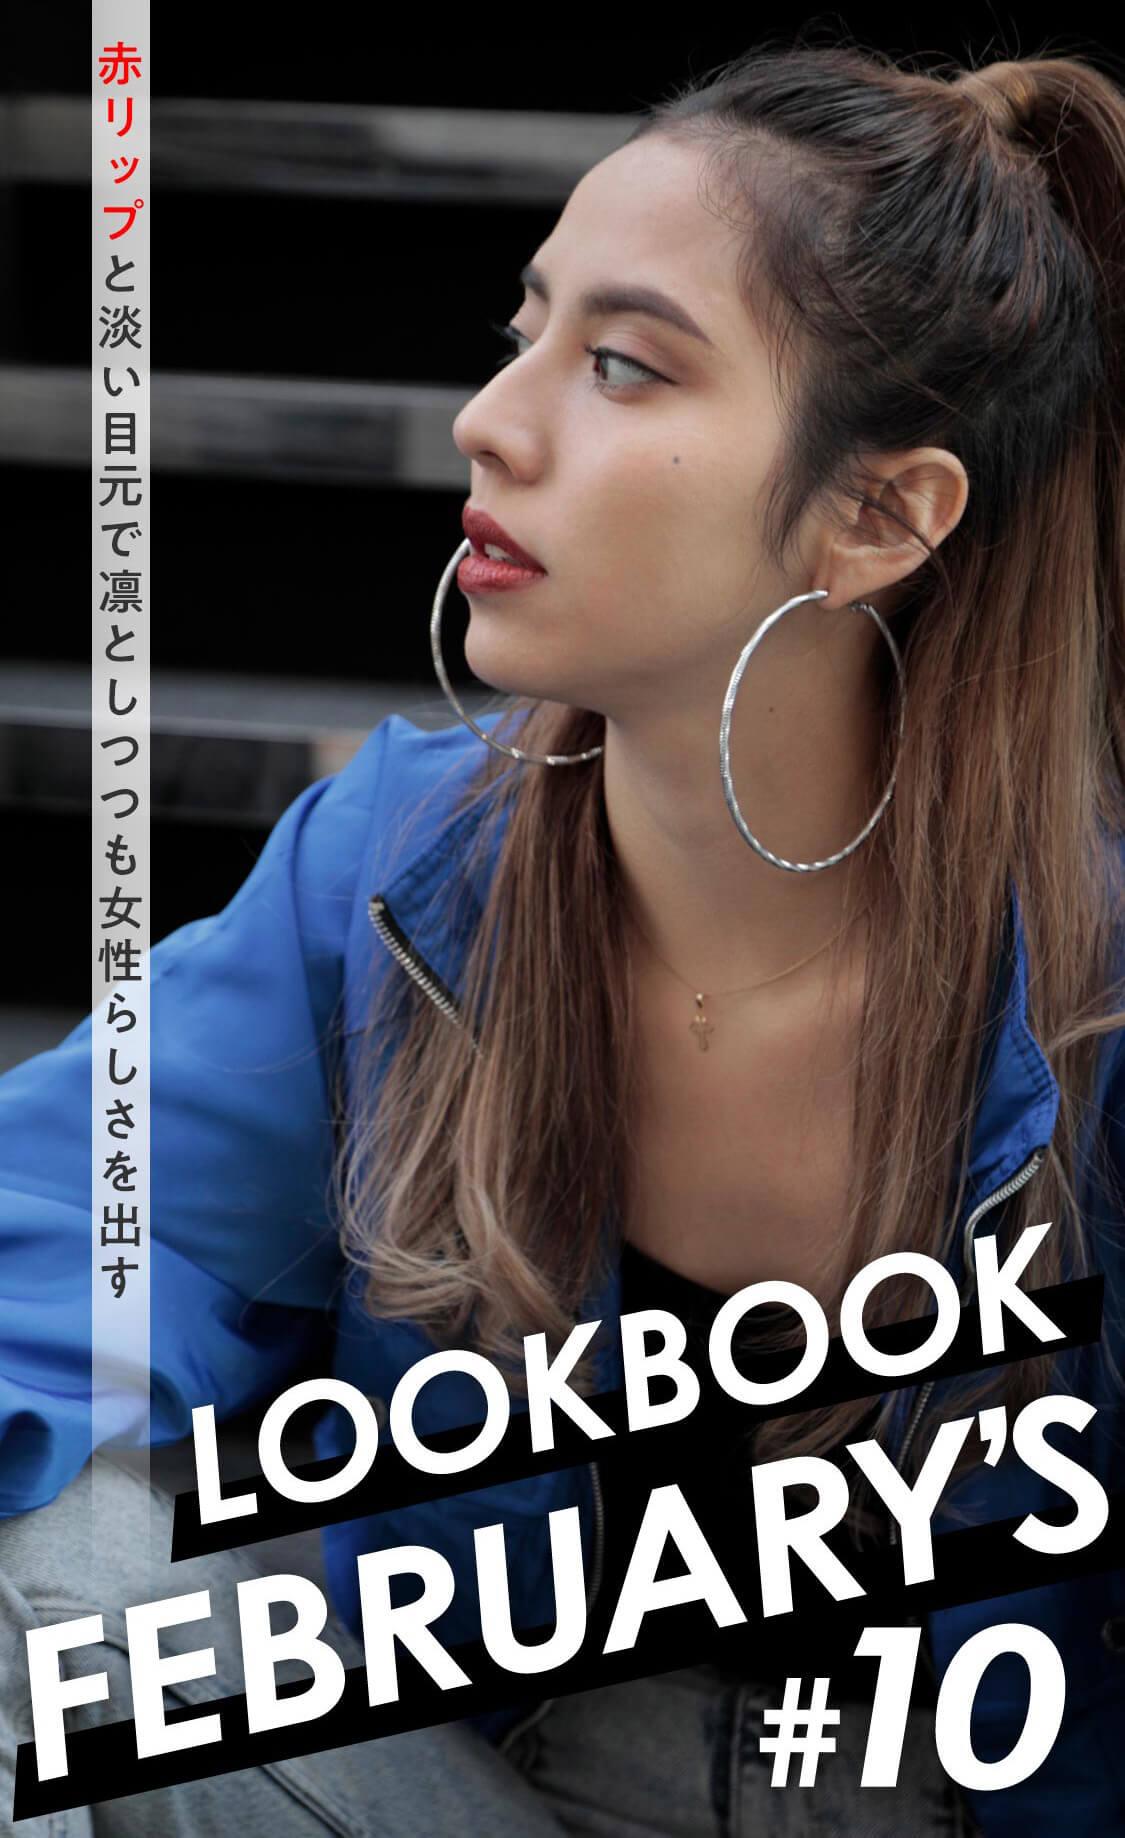 FEBRUARY'S LOOKBOOK vol.10